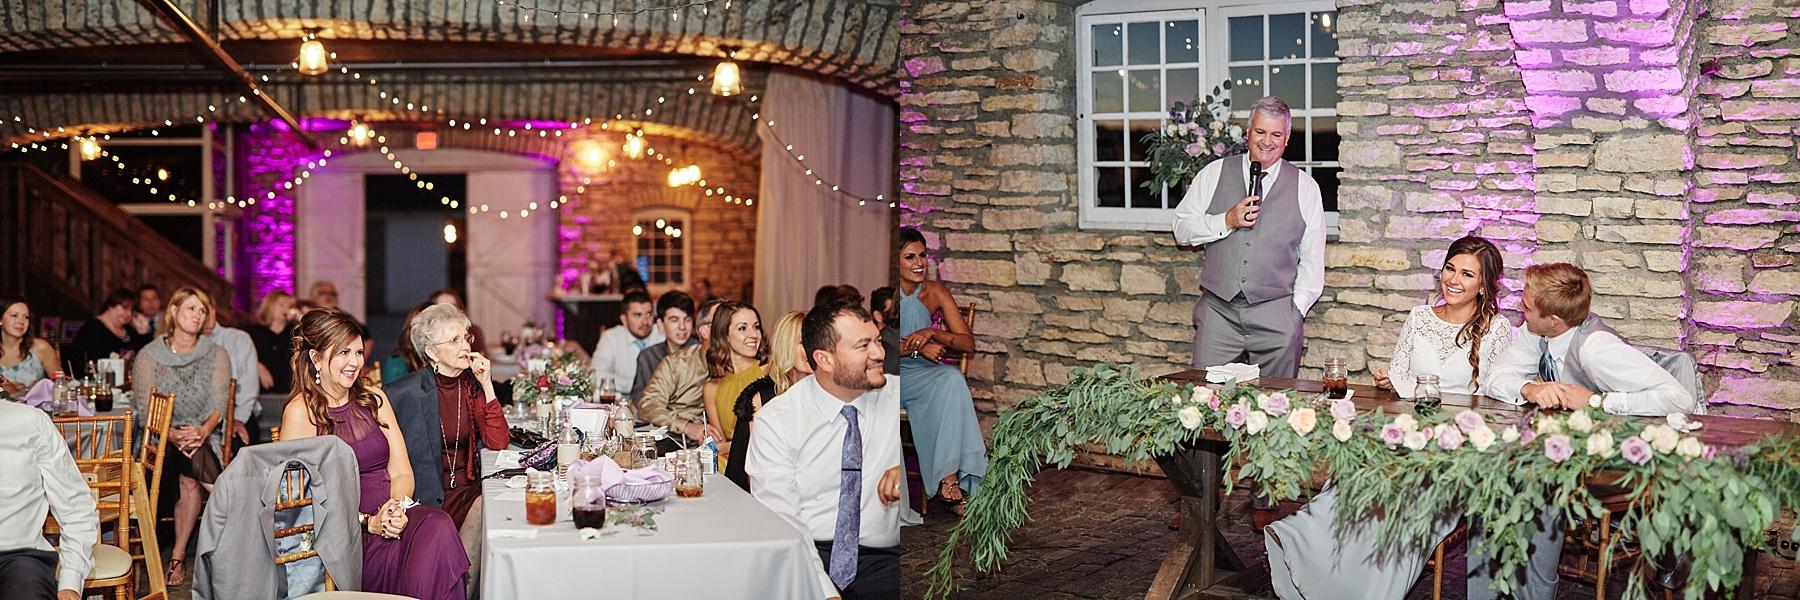 Maywood-Stone-Barn-Wedding-Rochester-Minnesota-Perry-James-Photo_0689.jpg